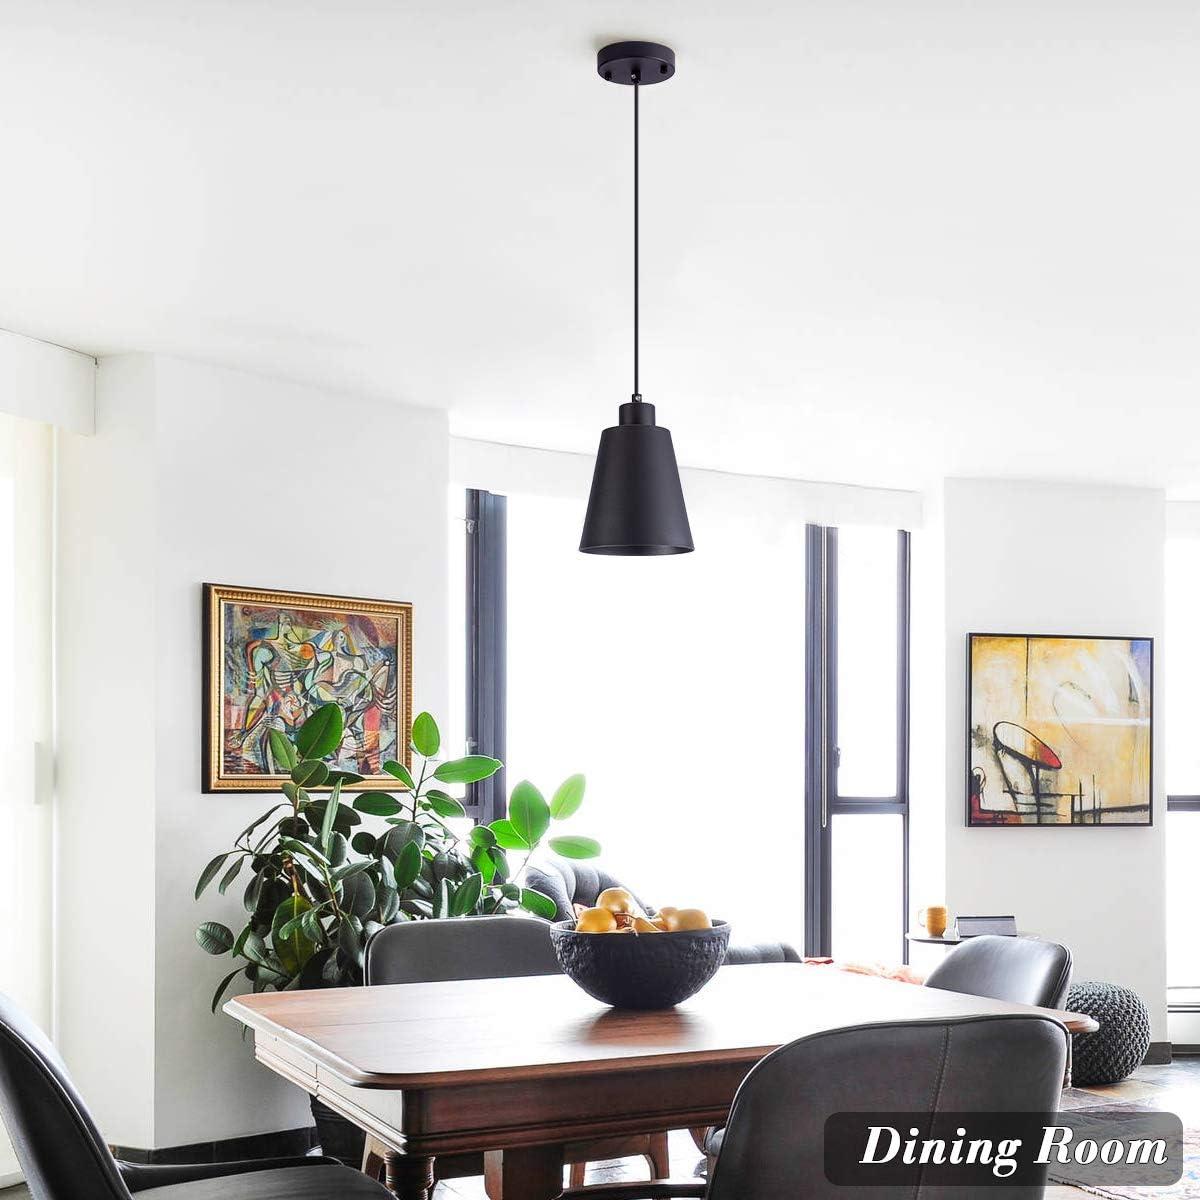 Modern Black Pendant Light Fixture Mini 1-light Pendant lighting for Kitchen Island Industrial Hanging Pendant Light Cup Shade for Dining Room,Foyer,Hallway,Bar,MAX40W,E26